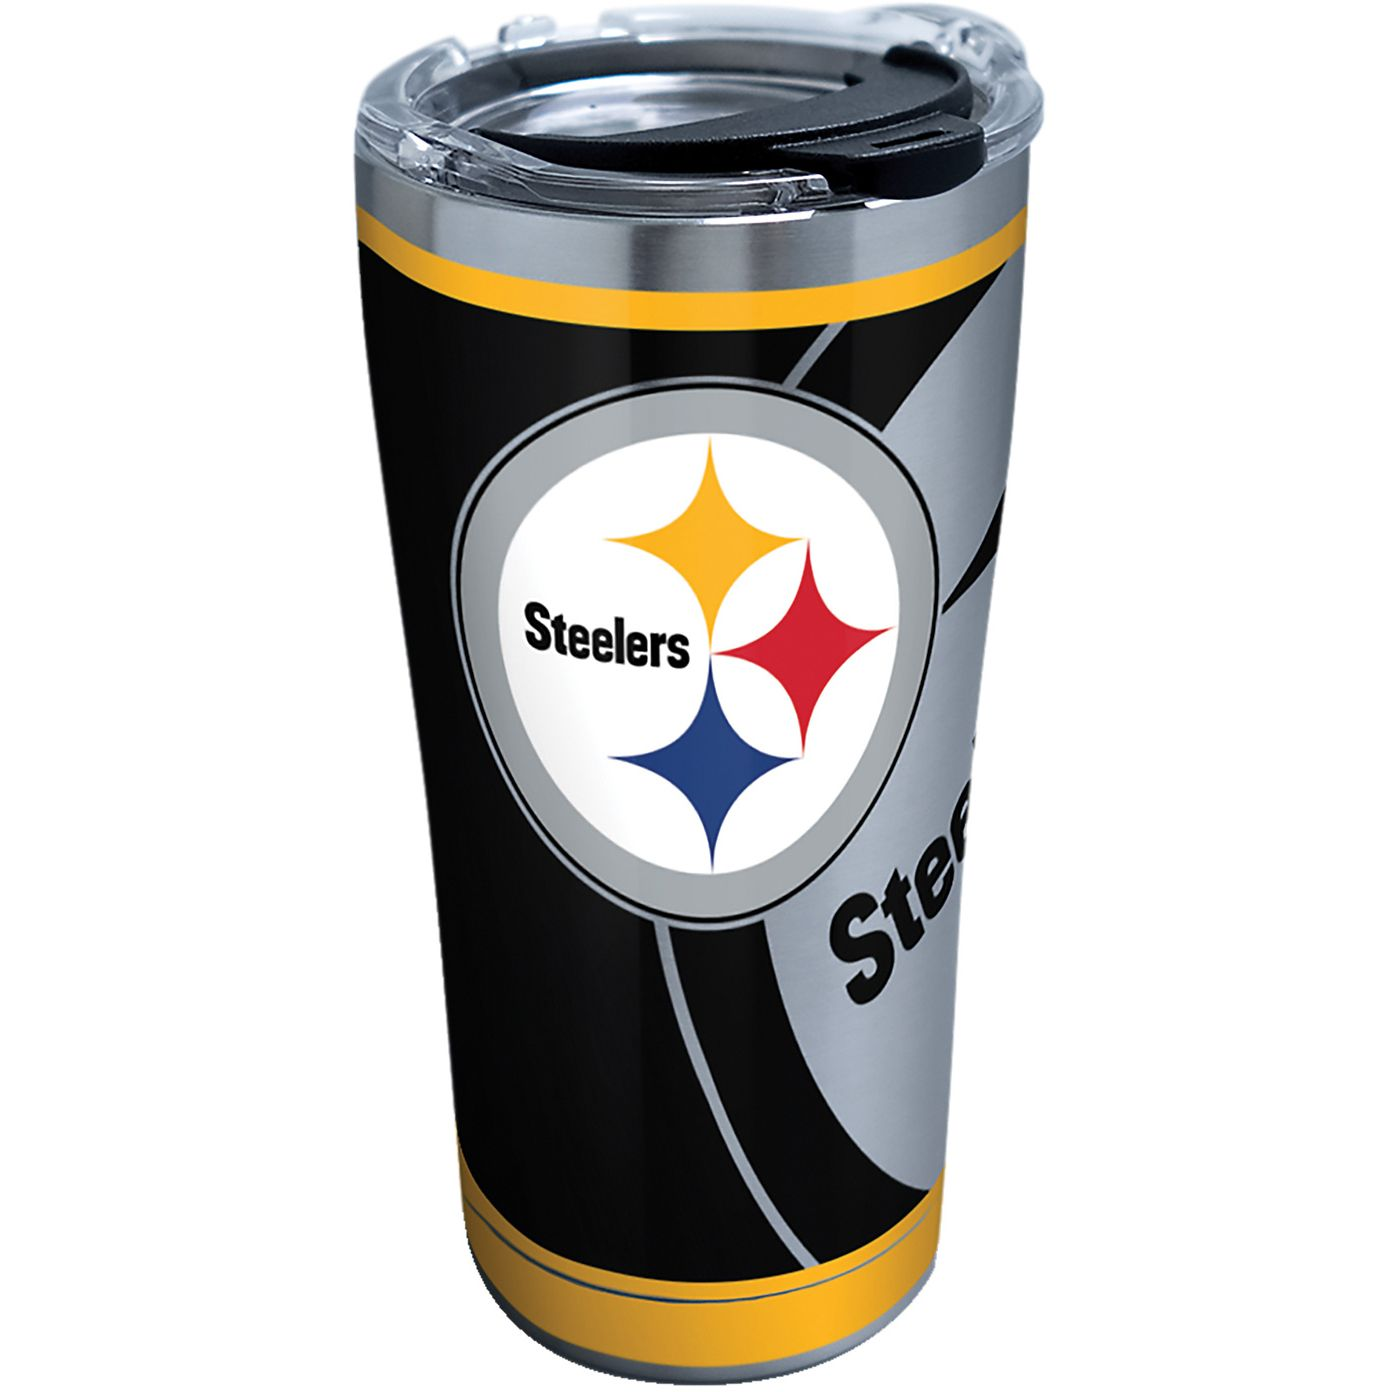 Tervis Pittsburgh Steelers 20oz. Stainless Steel Tumbler